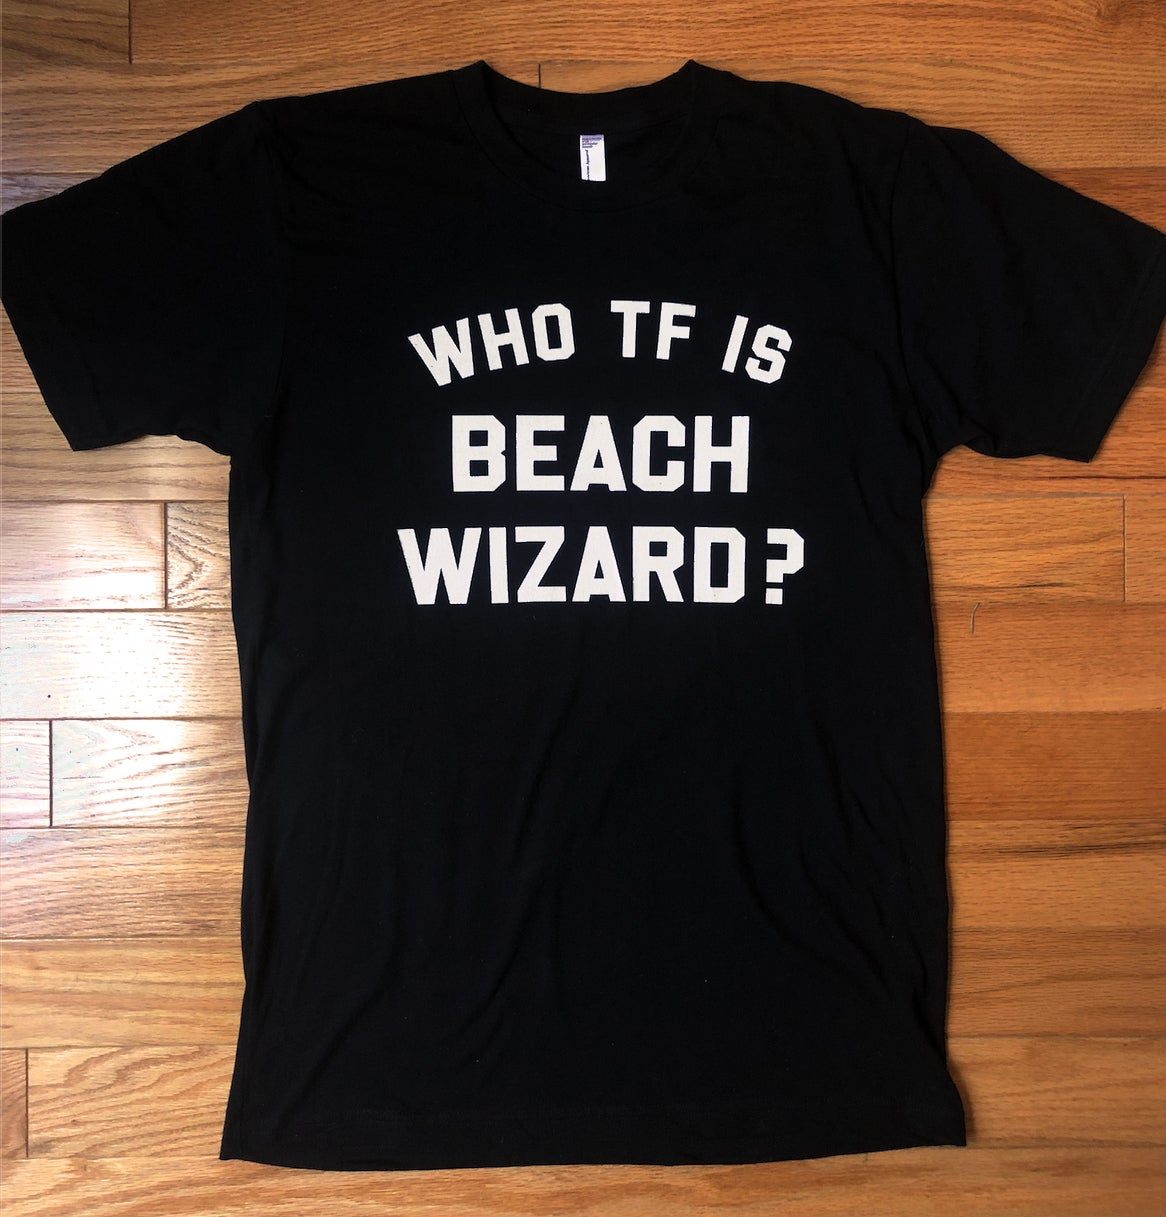 Image of Unisex Beach Wizard T-Shirt Black (WWF Donations)